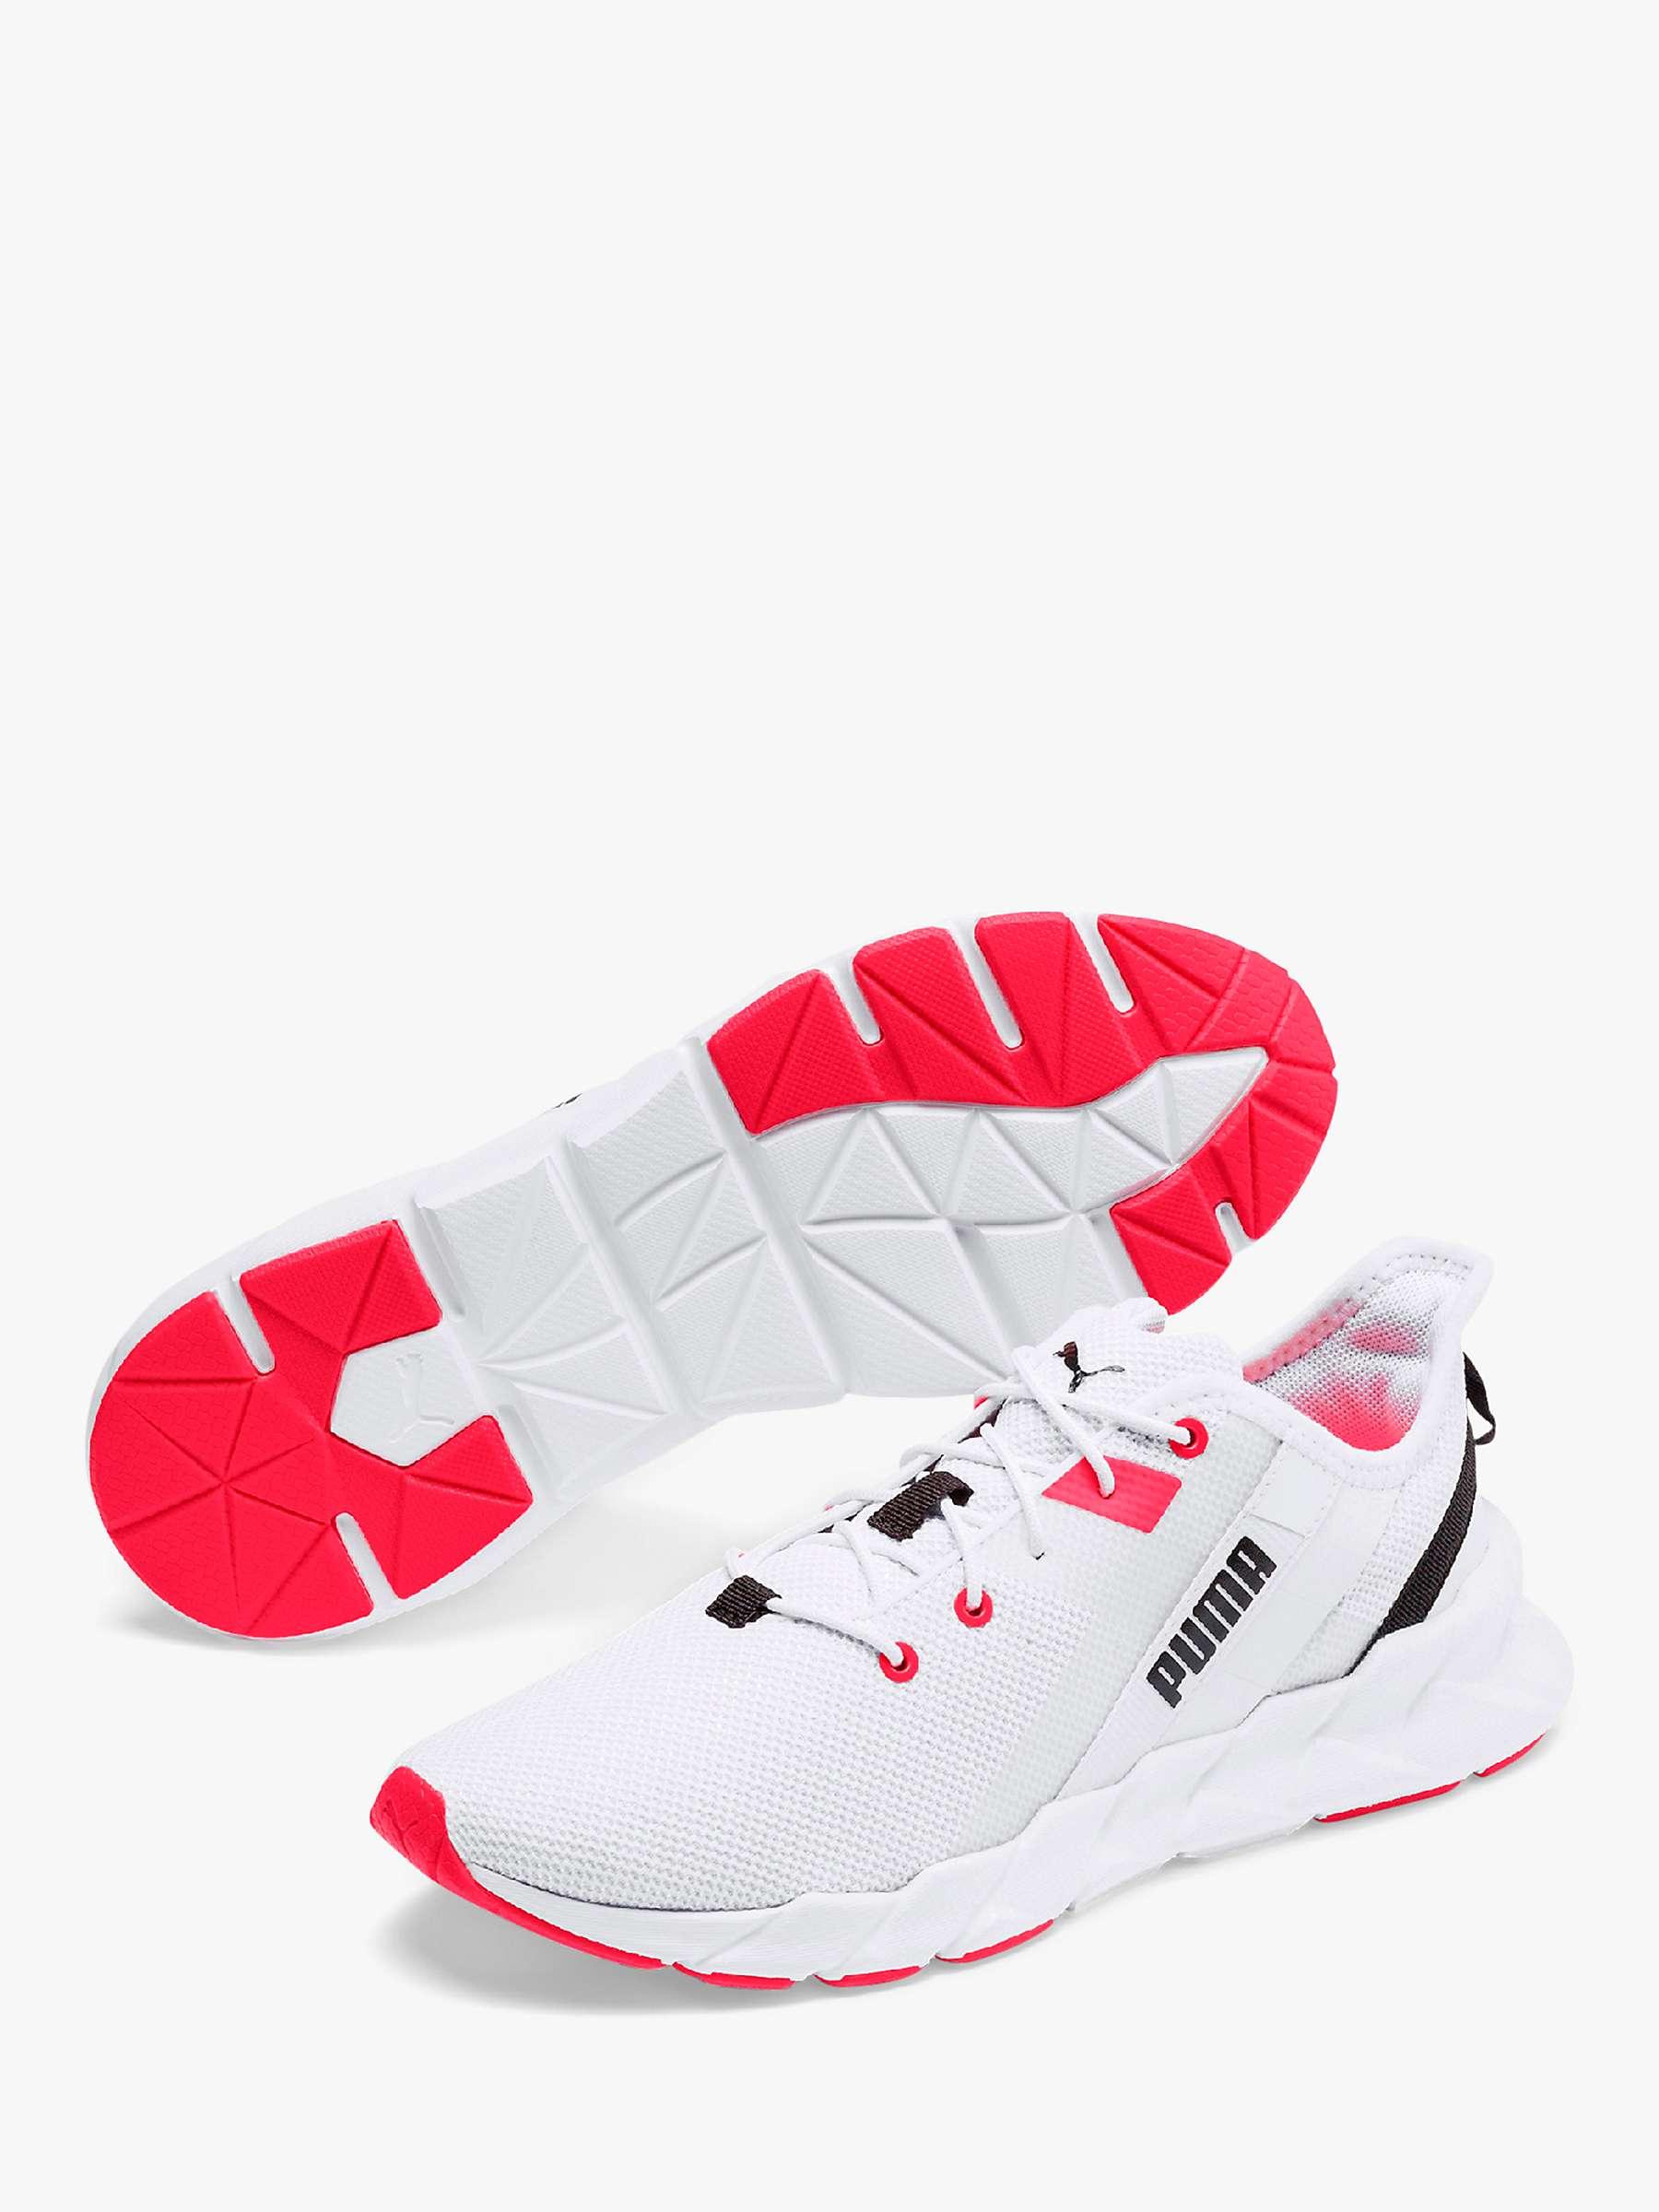 PUMA Weave XT Women's Running Shoes, PUMA White at John